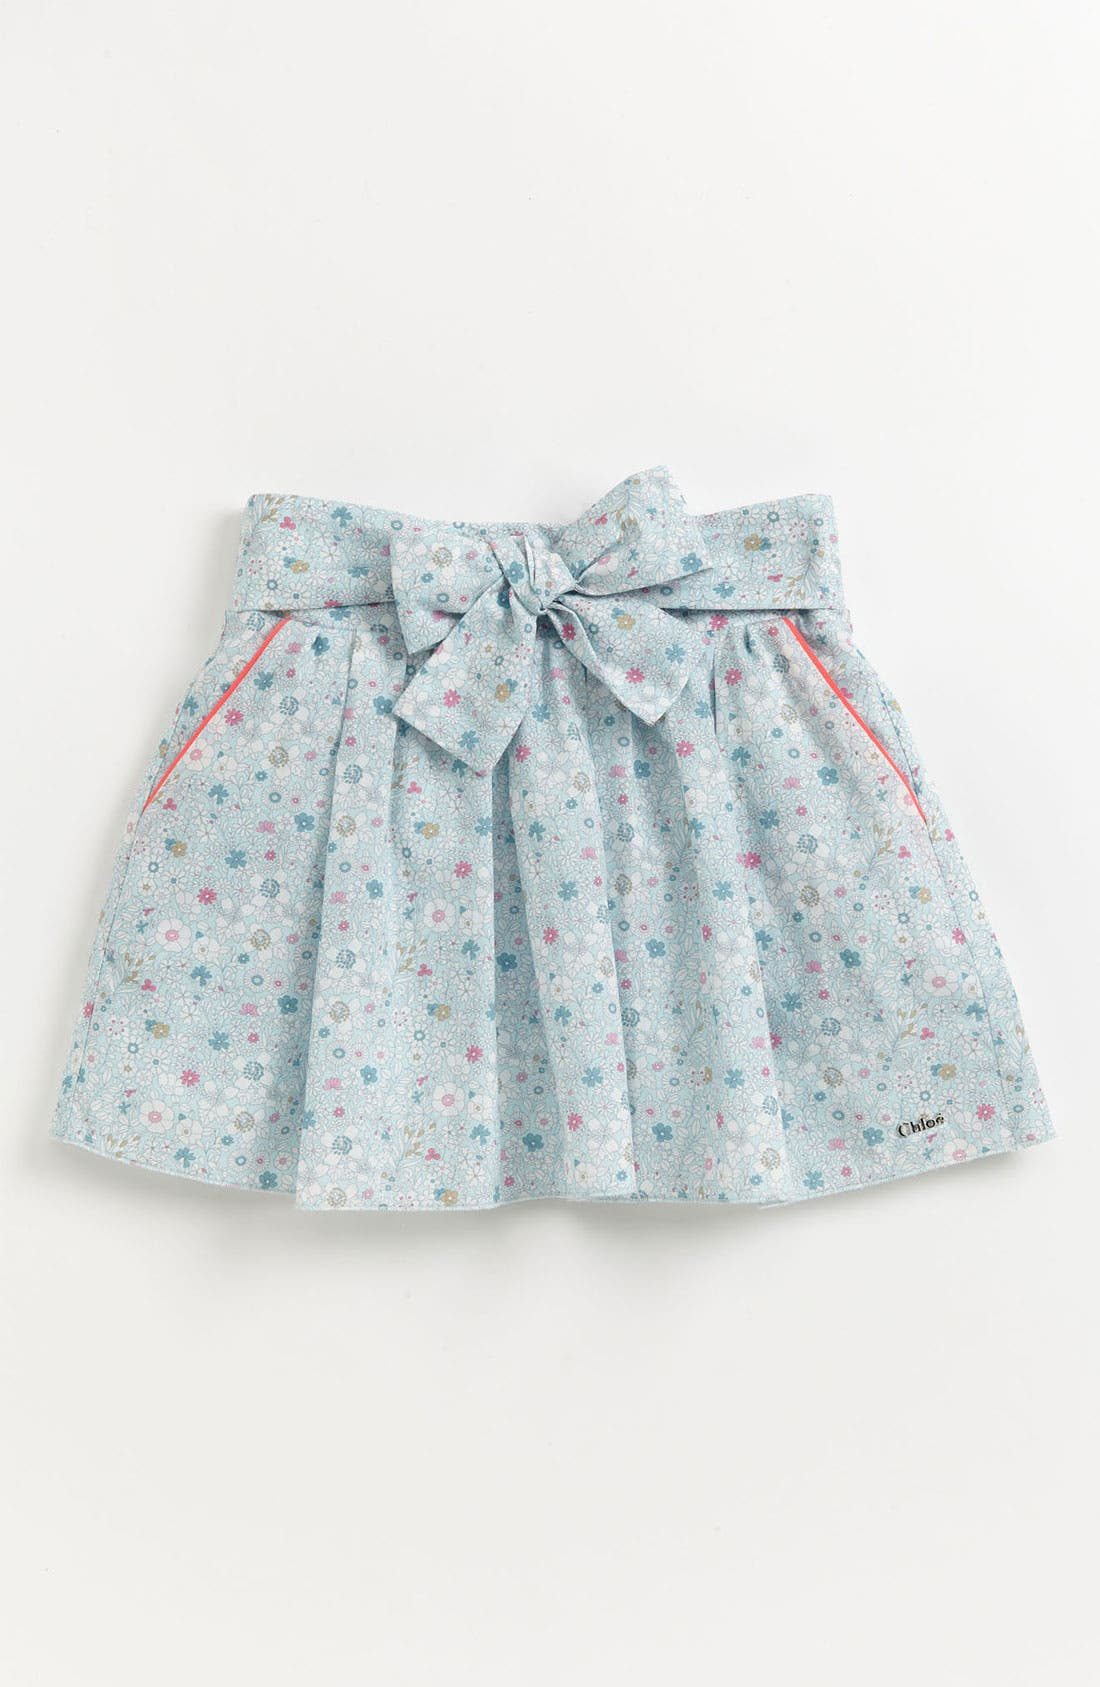 Alternate Image 1 Selected - Chloé 'Liberty Print' Floral Skirt (Toddler, Little Girls & Big Girls)